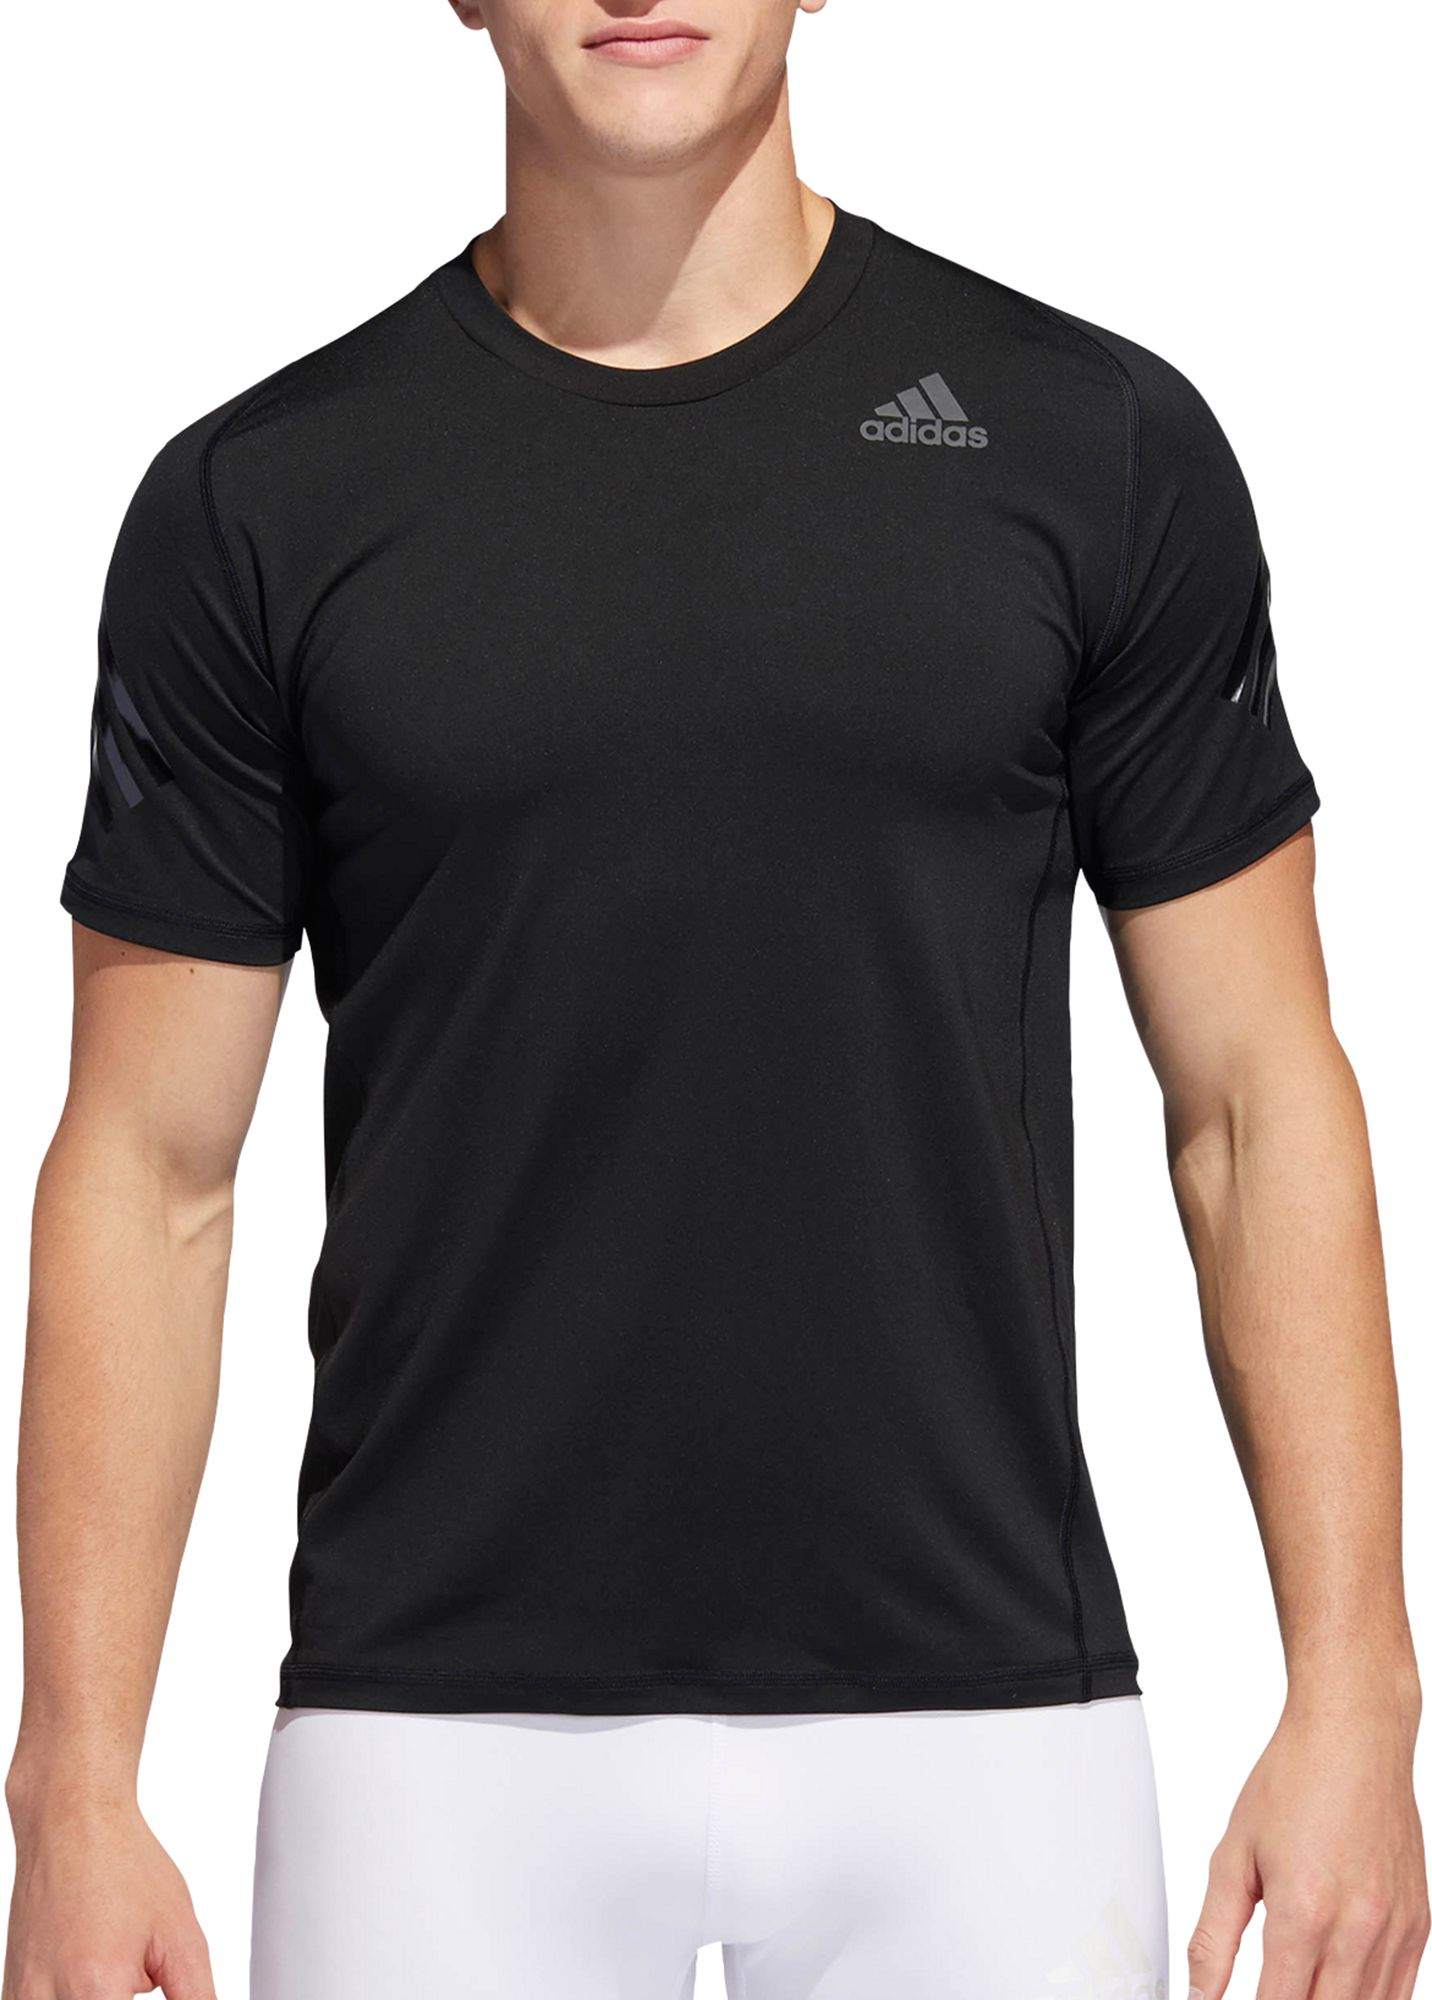 6e94dd76abbb adidas Men's Alphaskin Sport Fitted Training T-Shirt | DICK'S ...